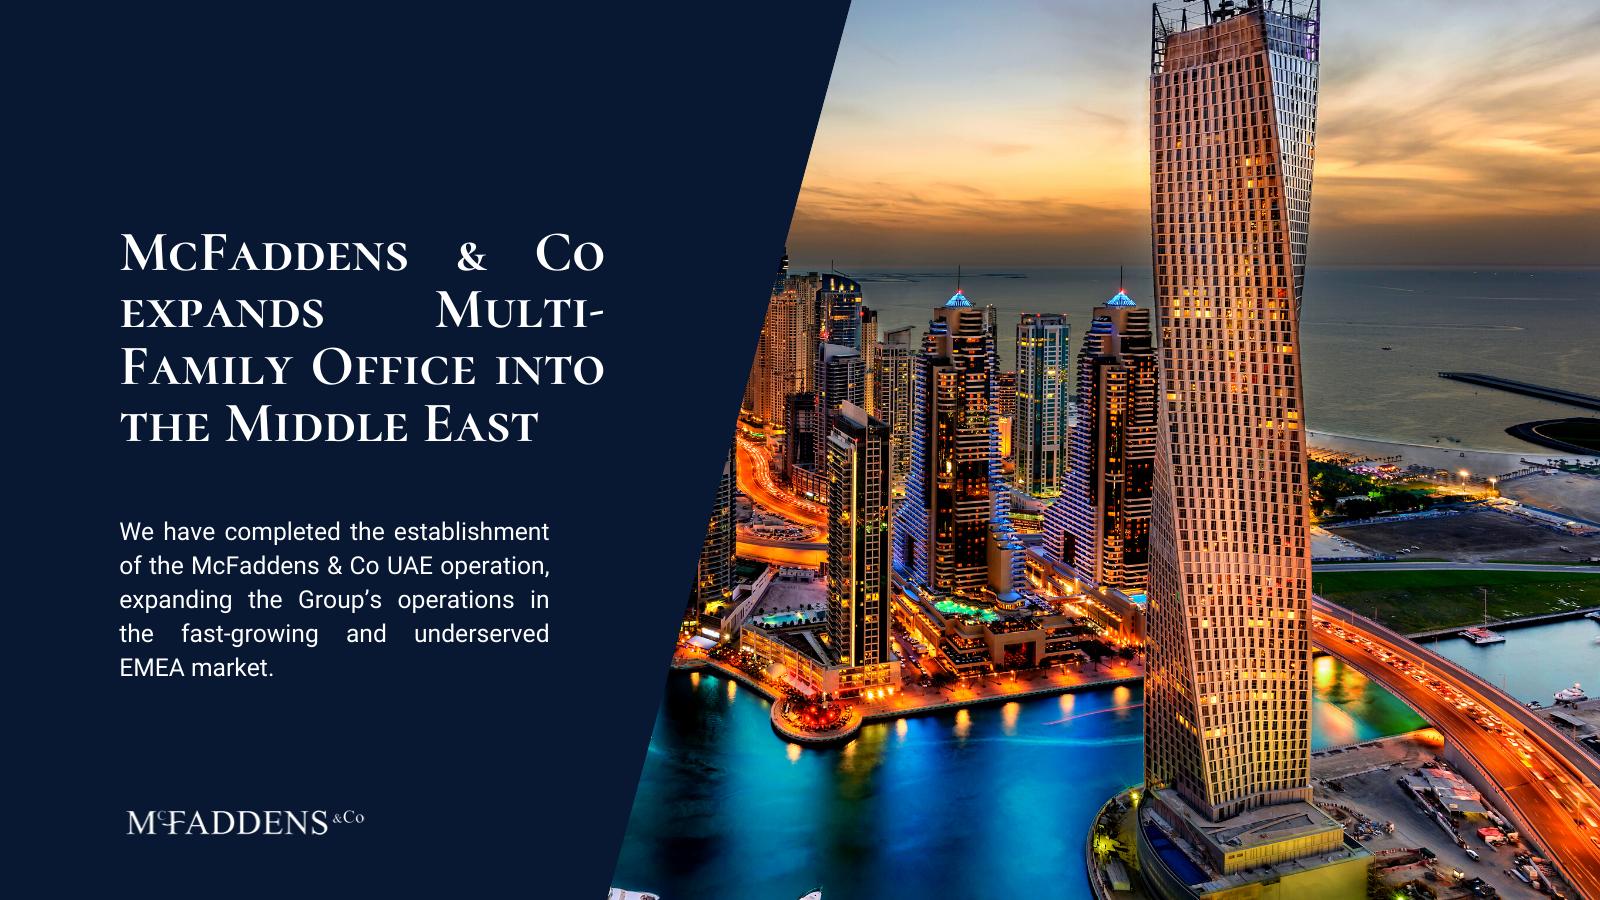 establishment McFaddens & Co UAE operation